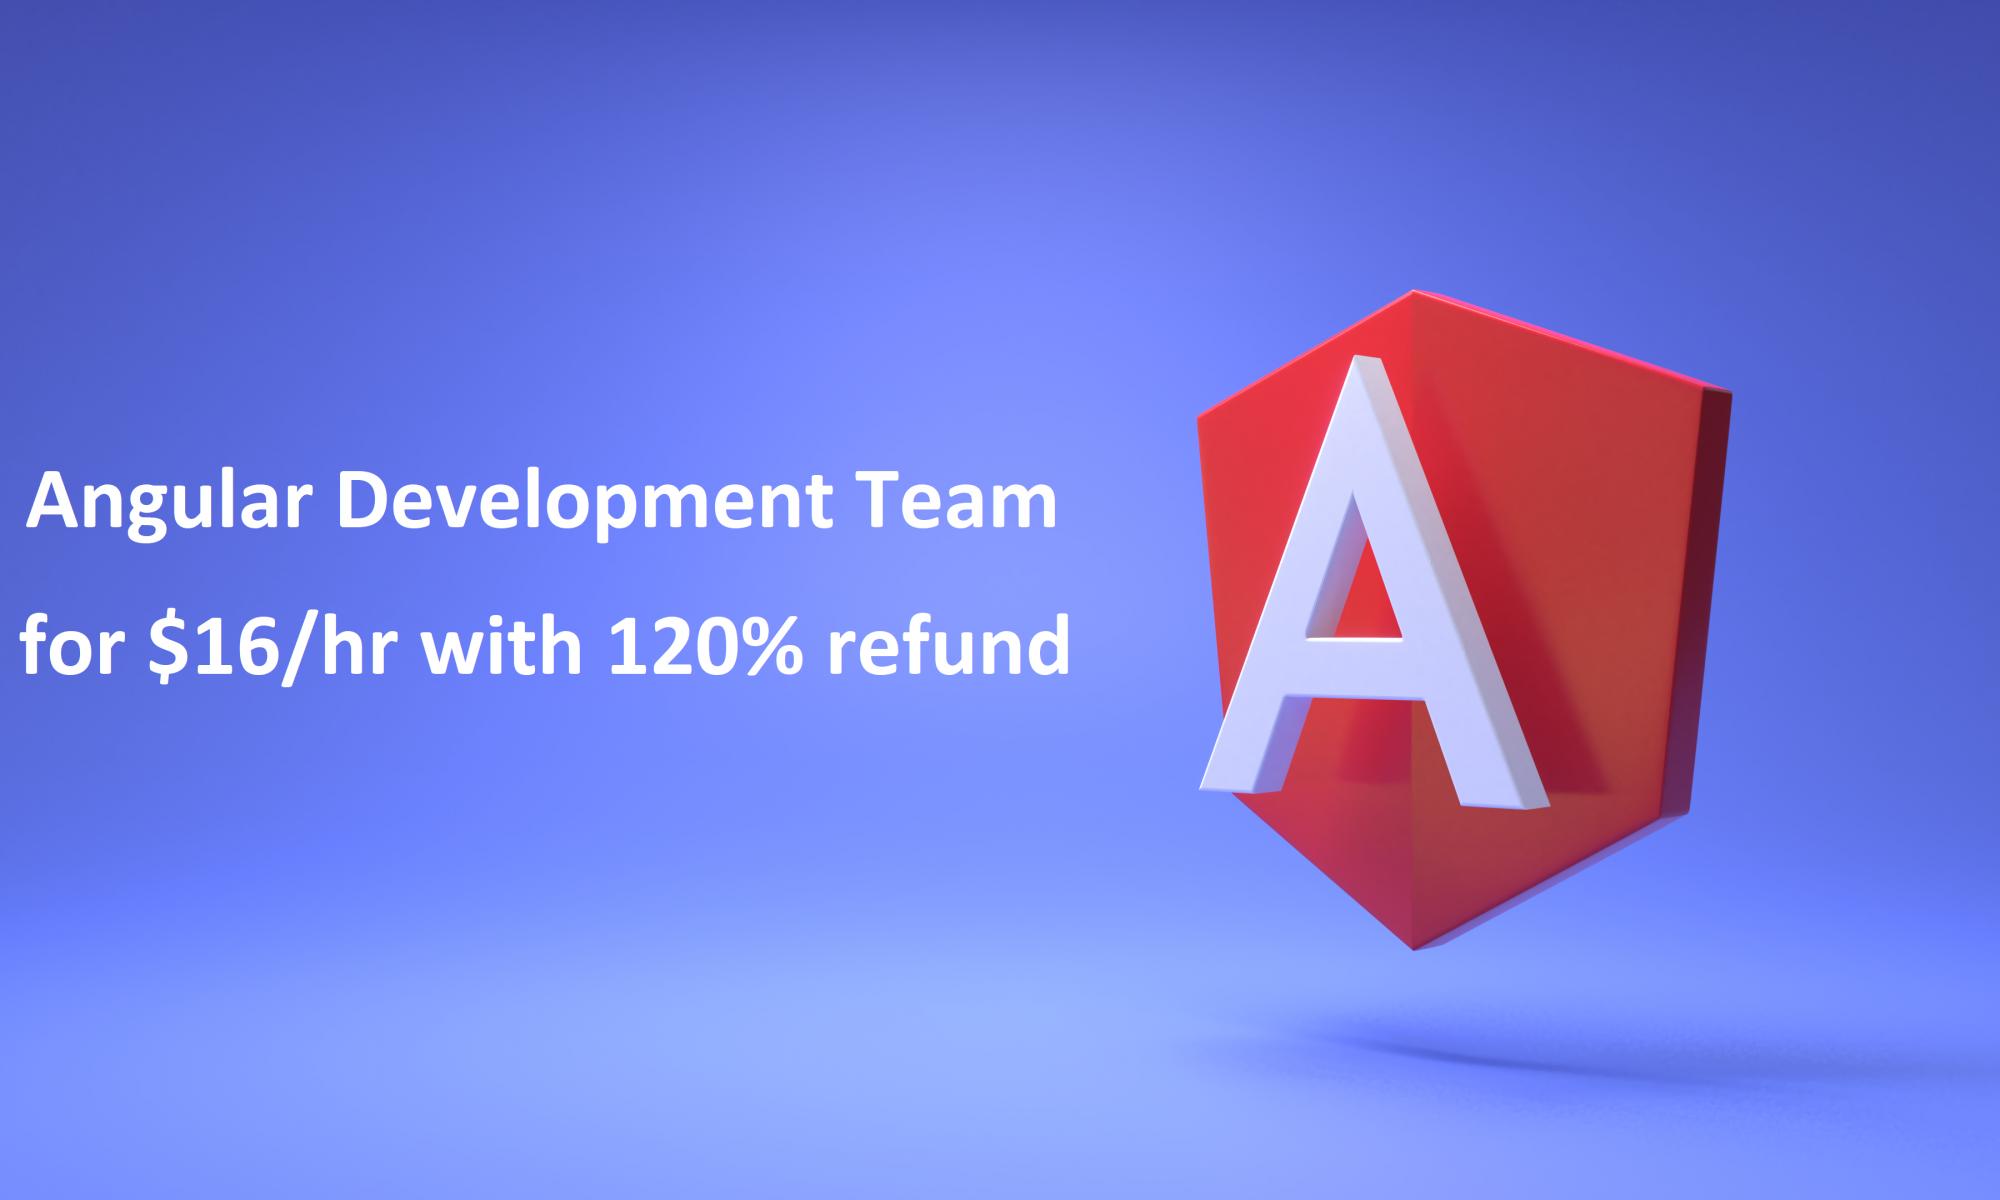 Angular Development Team